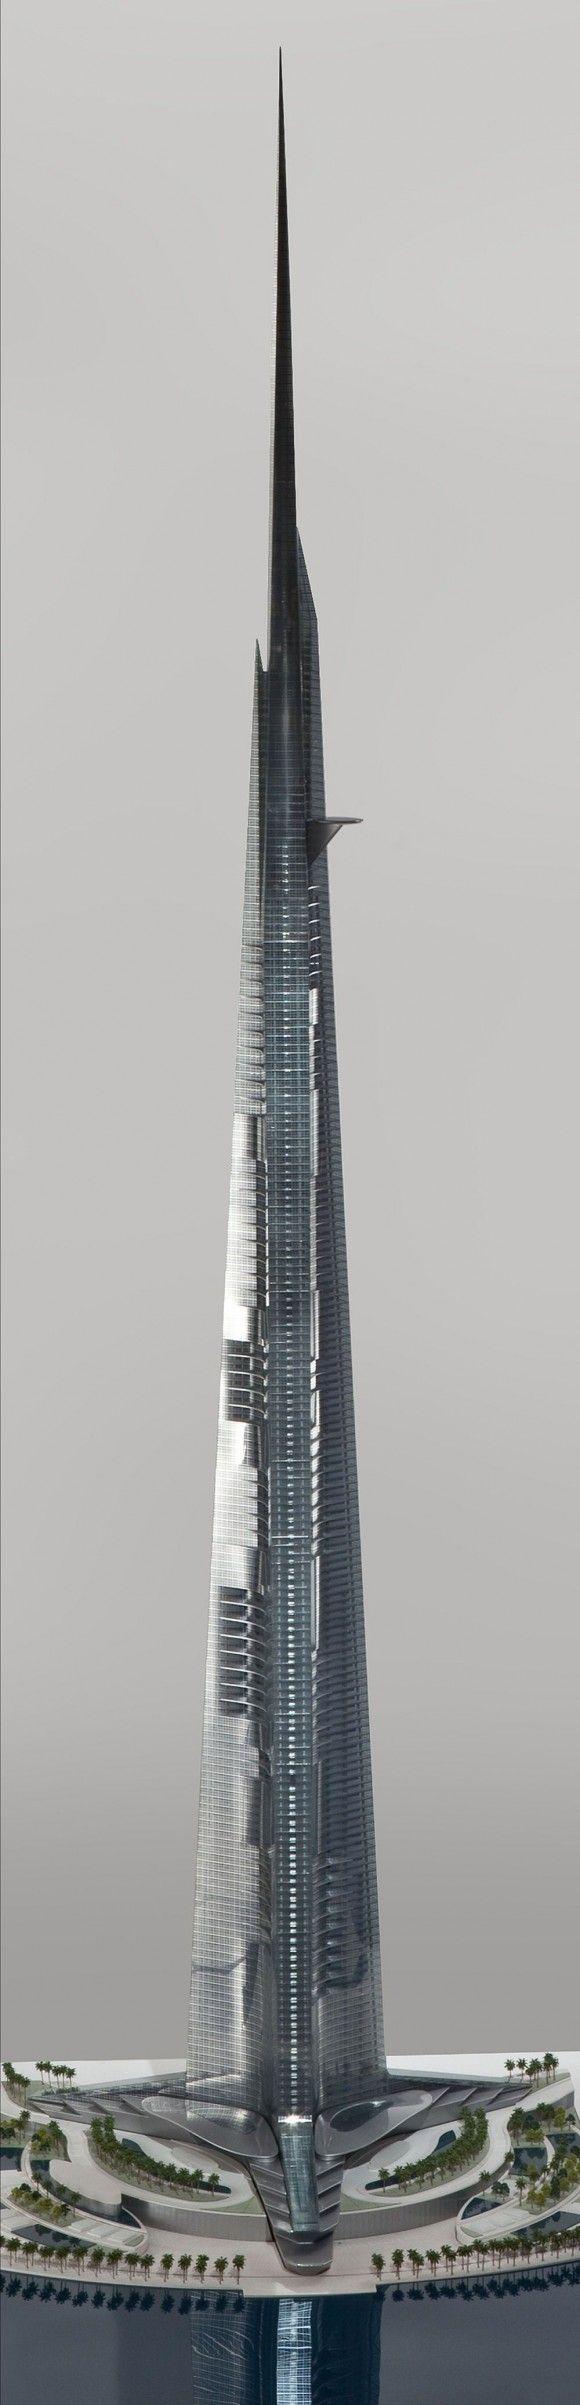 Kingdom tower in jeddah jeddah world and skyscrapers for Burj al mamlakah